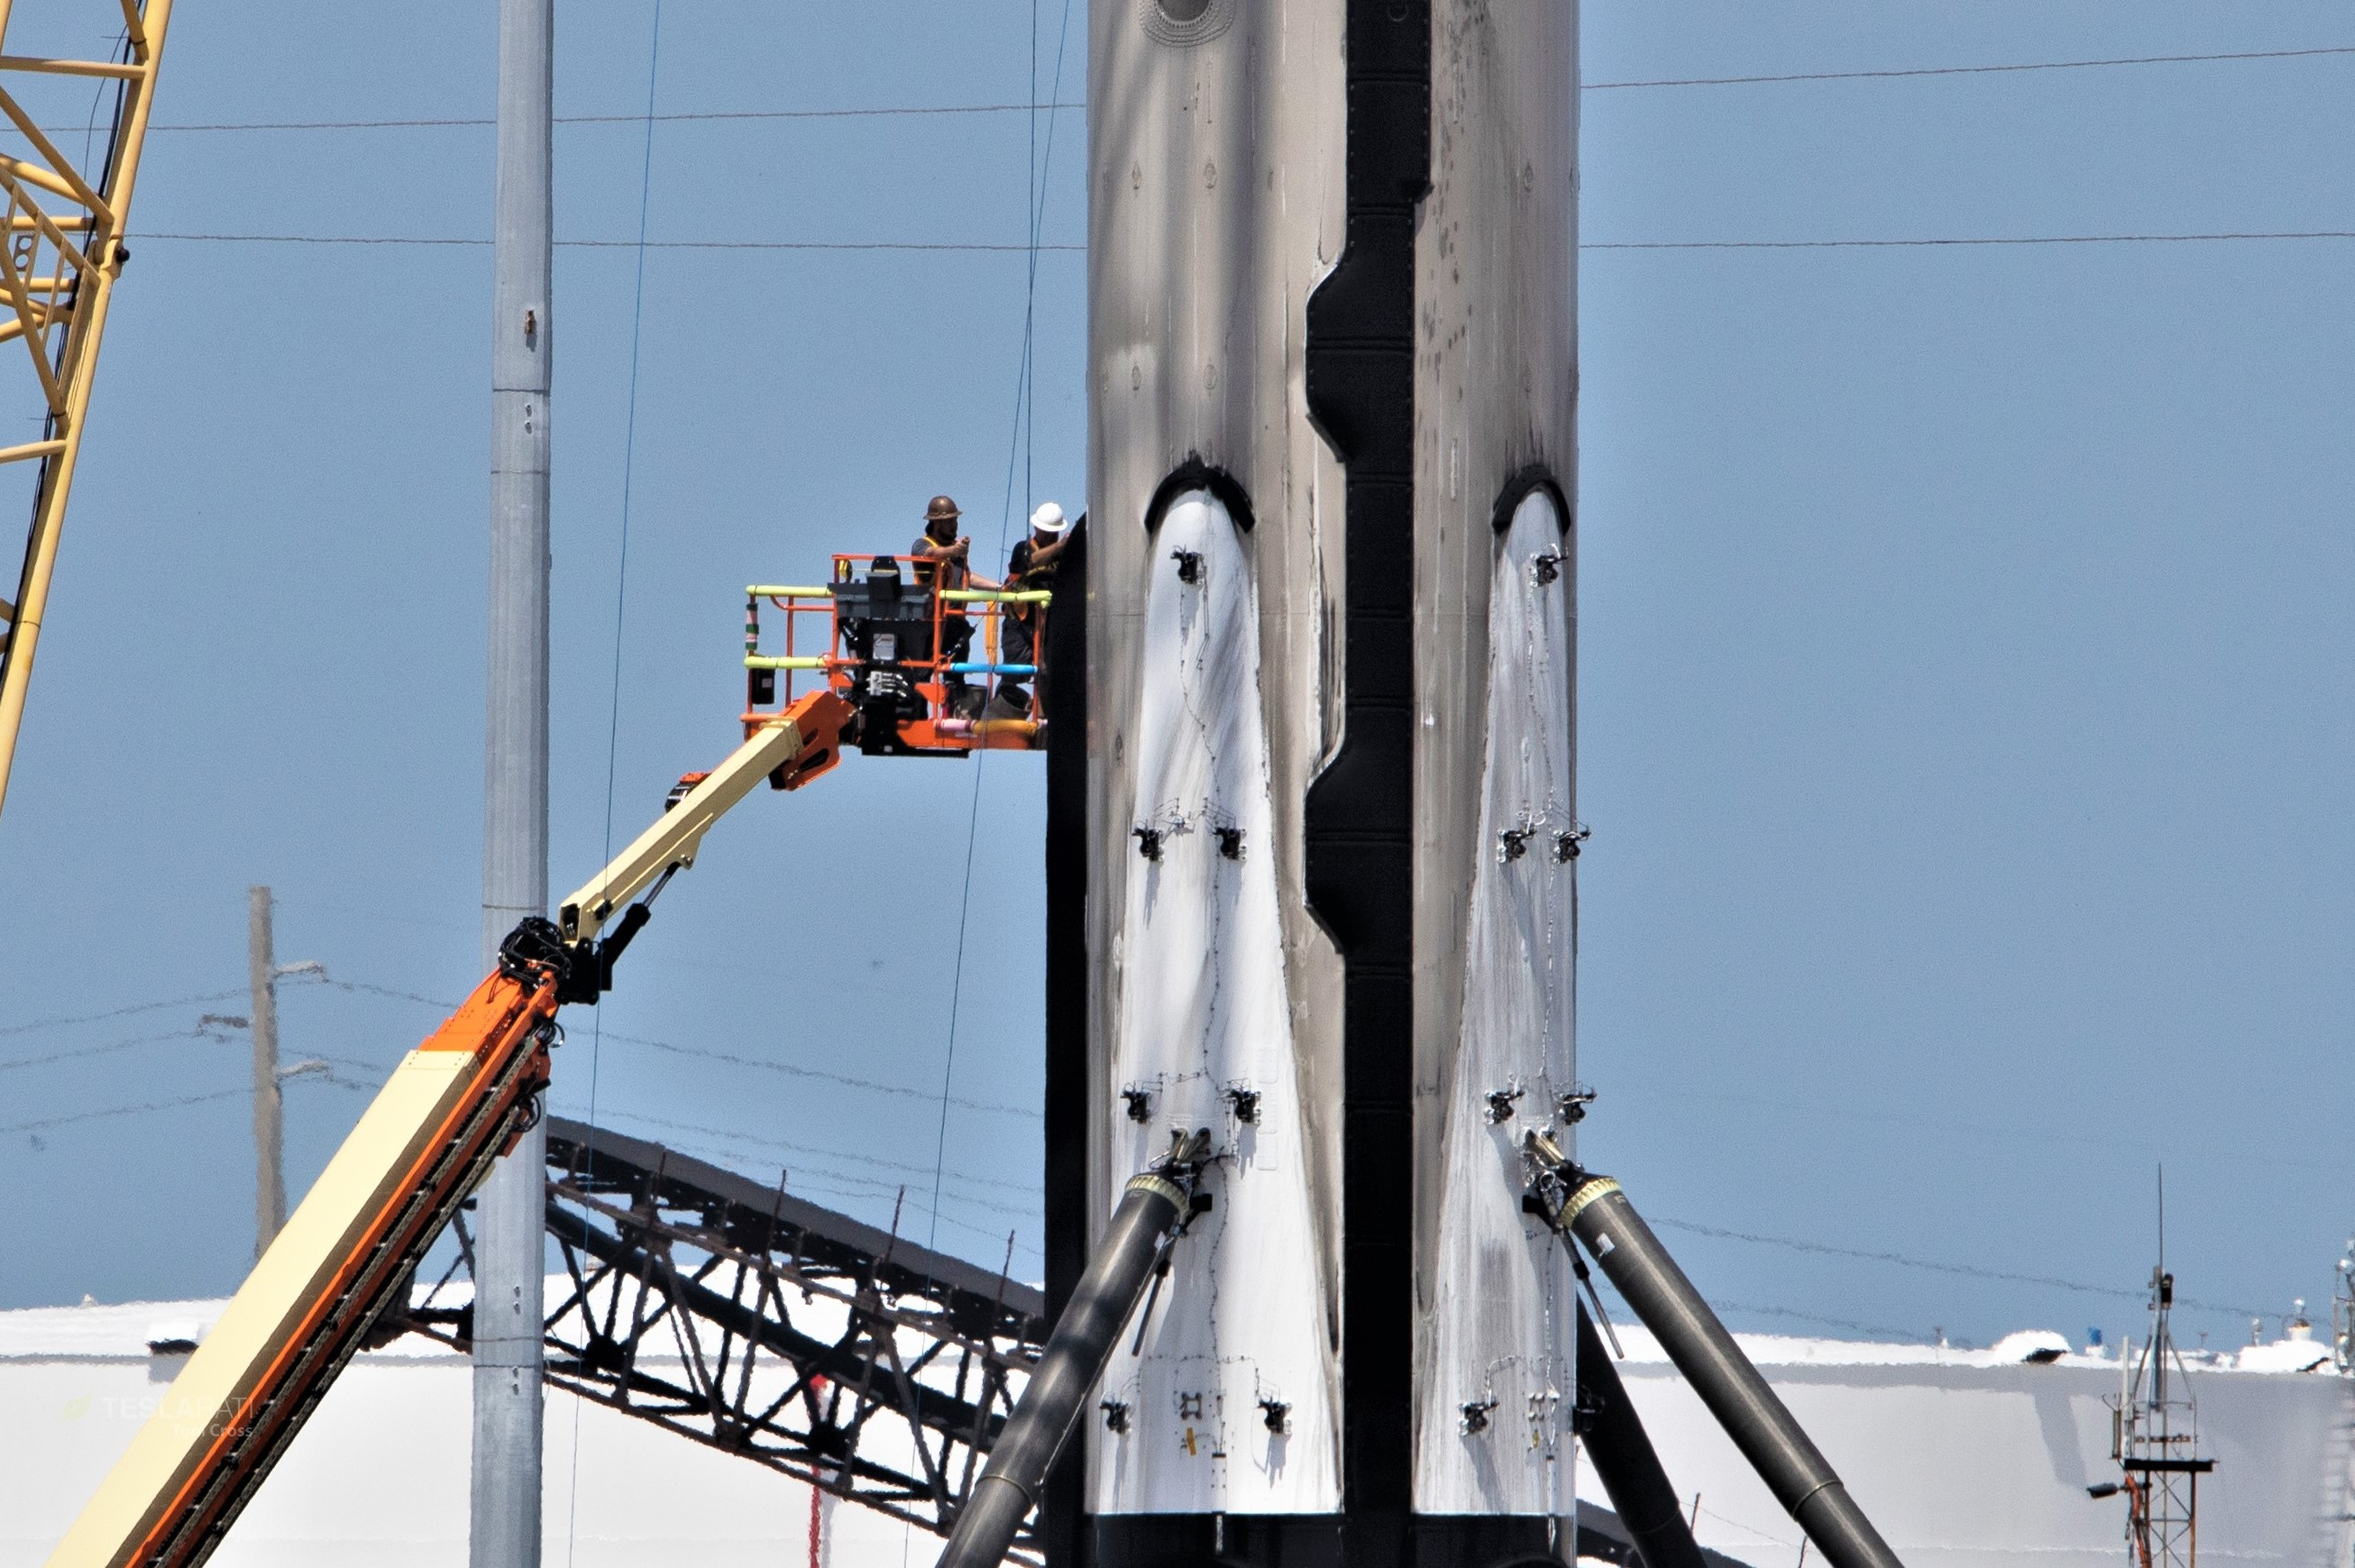 Falcon 9 b1056 leg retraction 1 of 4 050719 (Tom Cross) 2